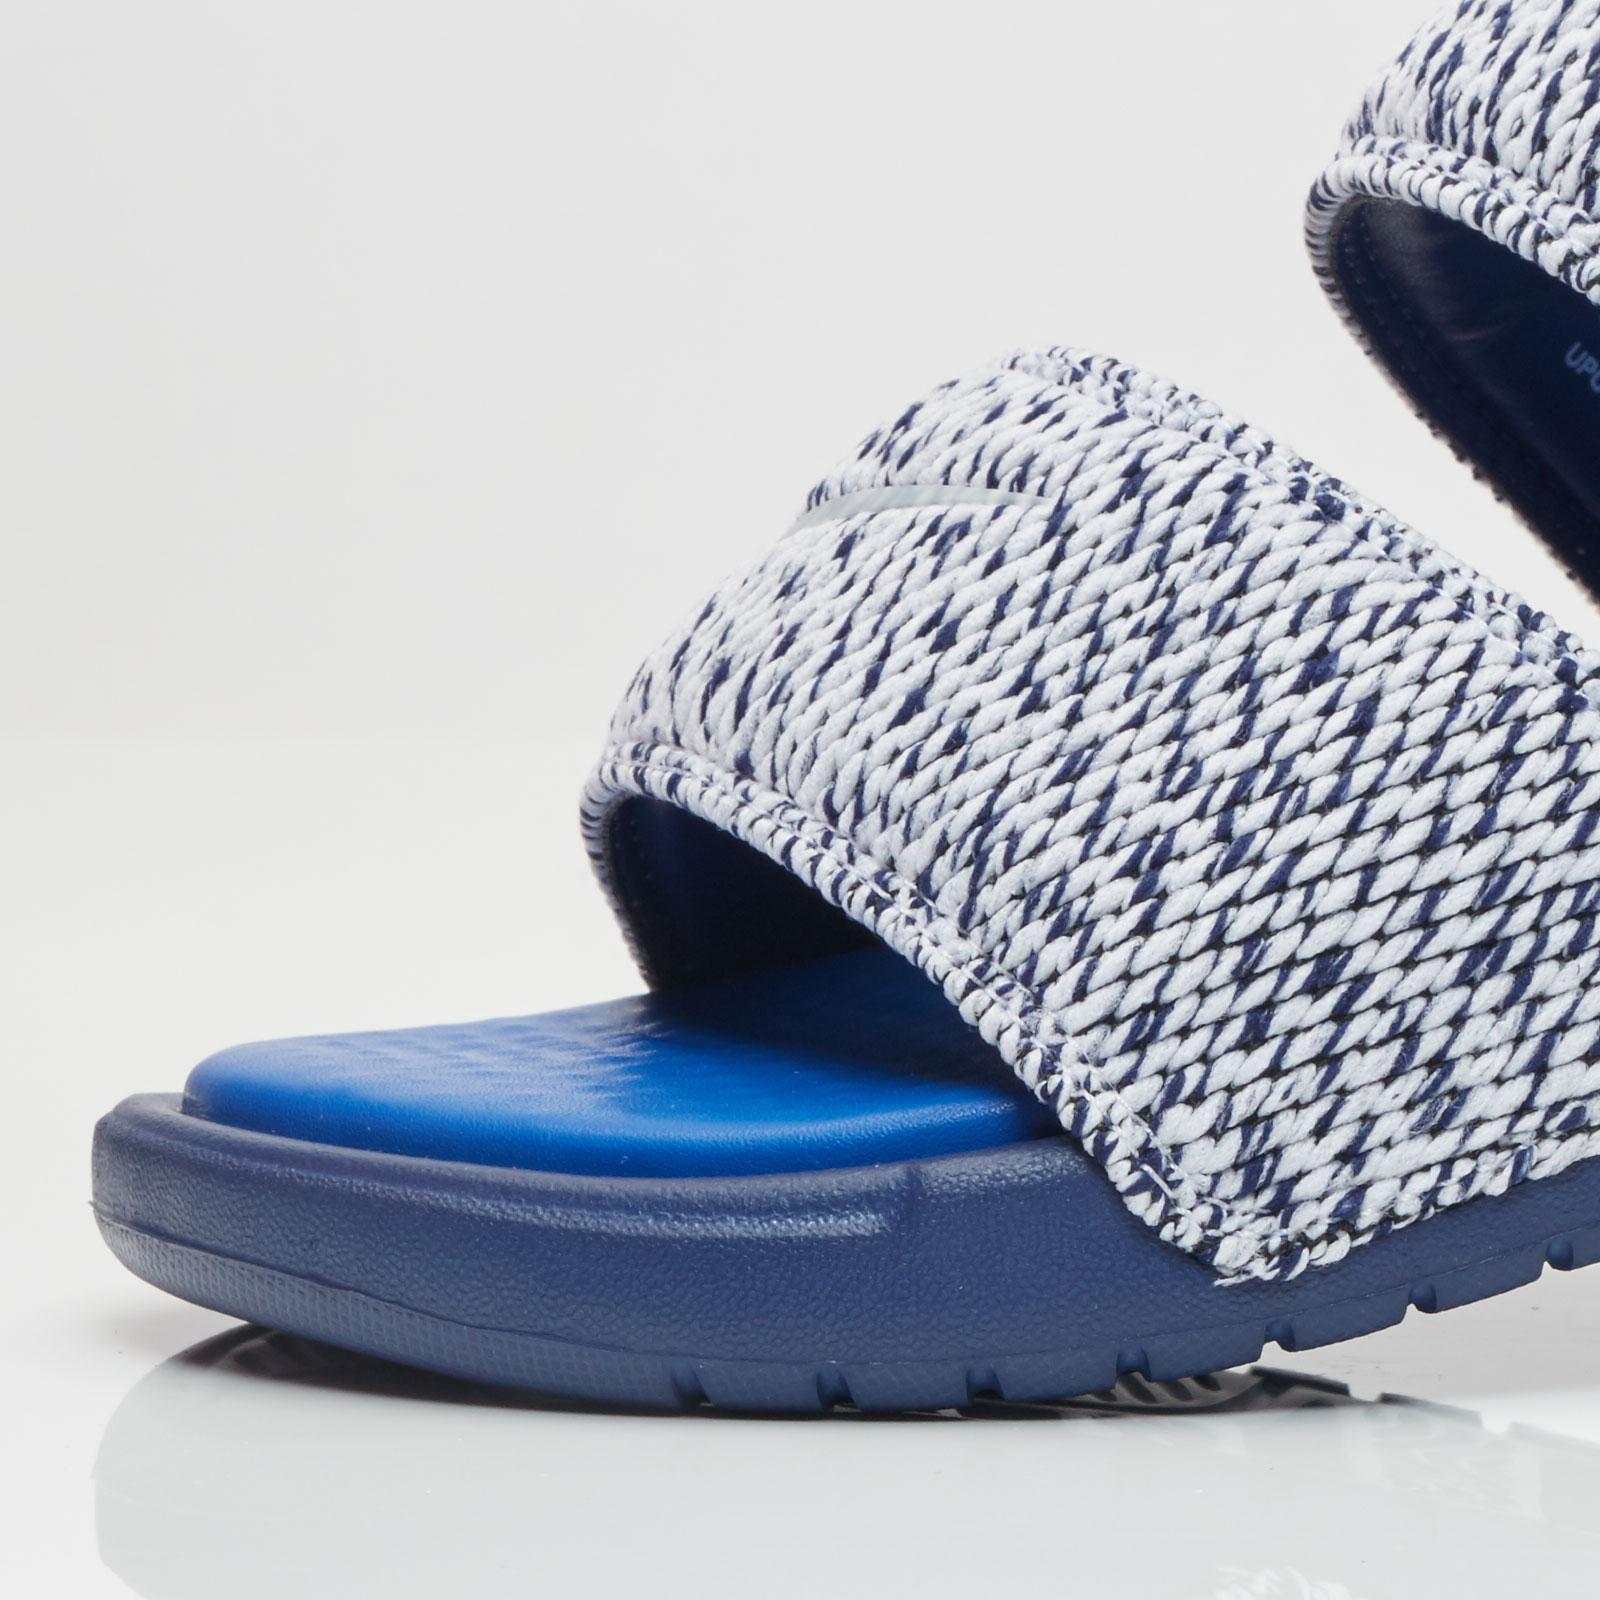 d03423ac3b432c Nike Benassi Duo Ultra Slide   Pigalle - 902783-400 - Sneakersnstuff ...